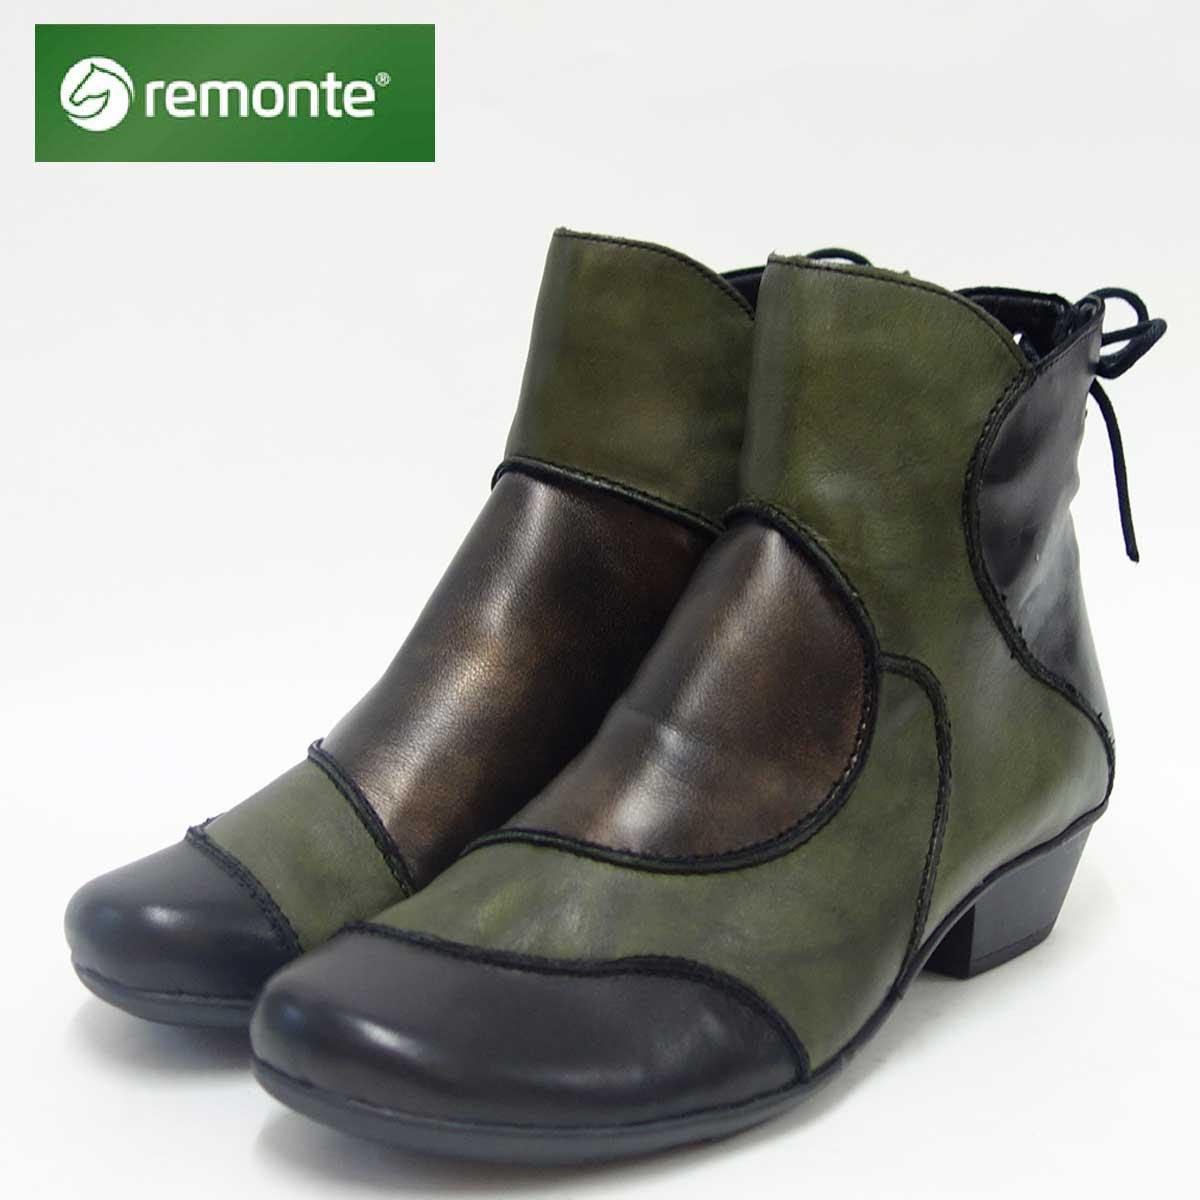 REMONTE レモンテ 7380 グリーンコンビお洒落で履き良いショートブーツリーカーの姉妹ブランド「靴」